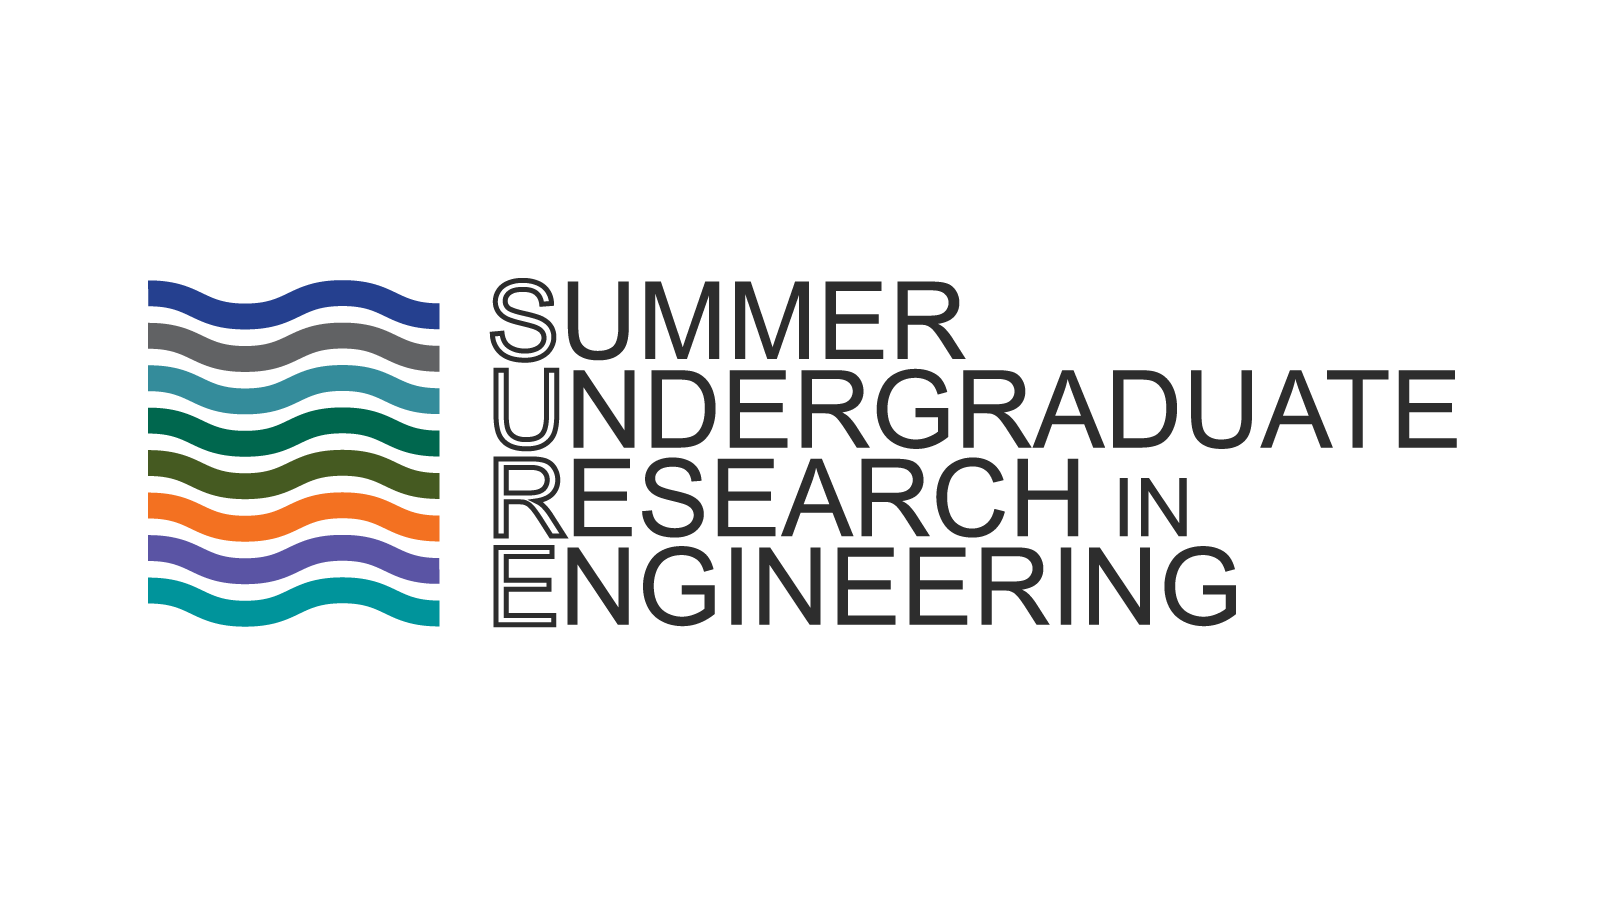 Summer Undergraduate Research In Engineering